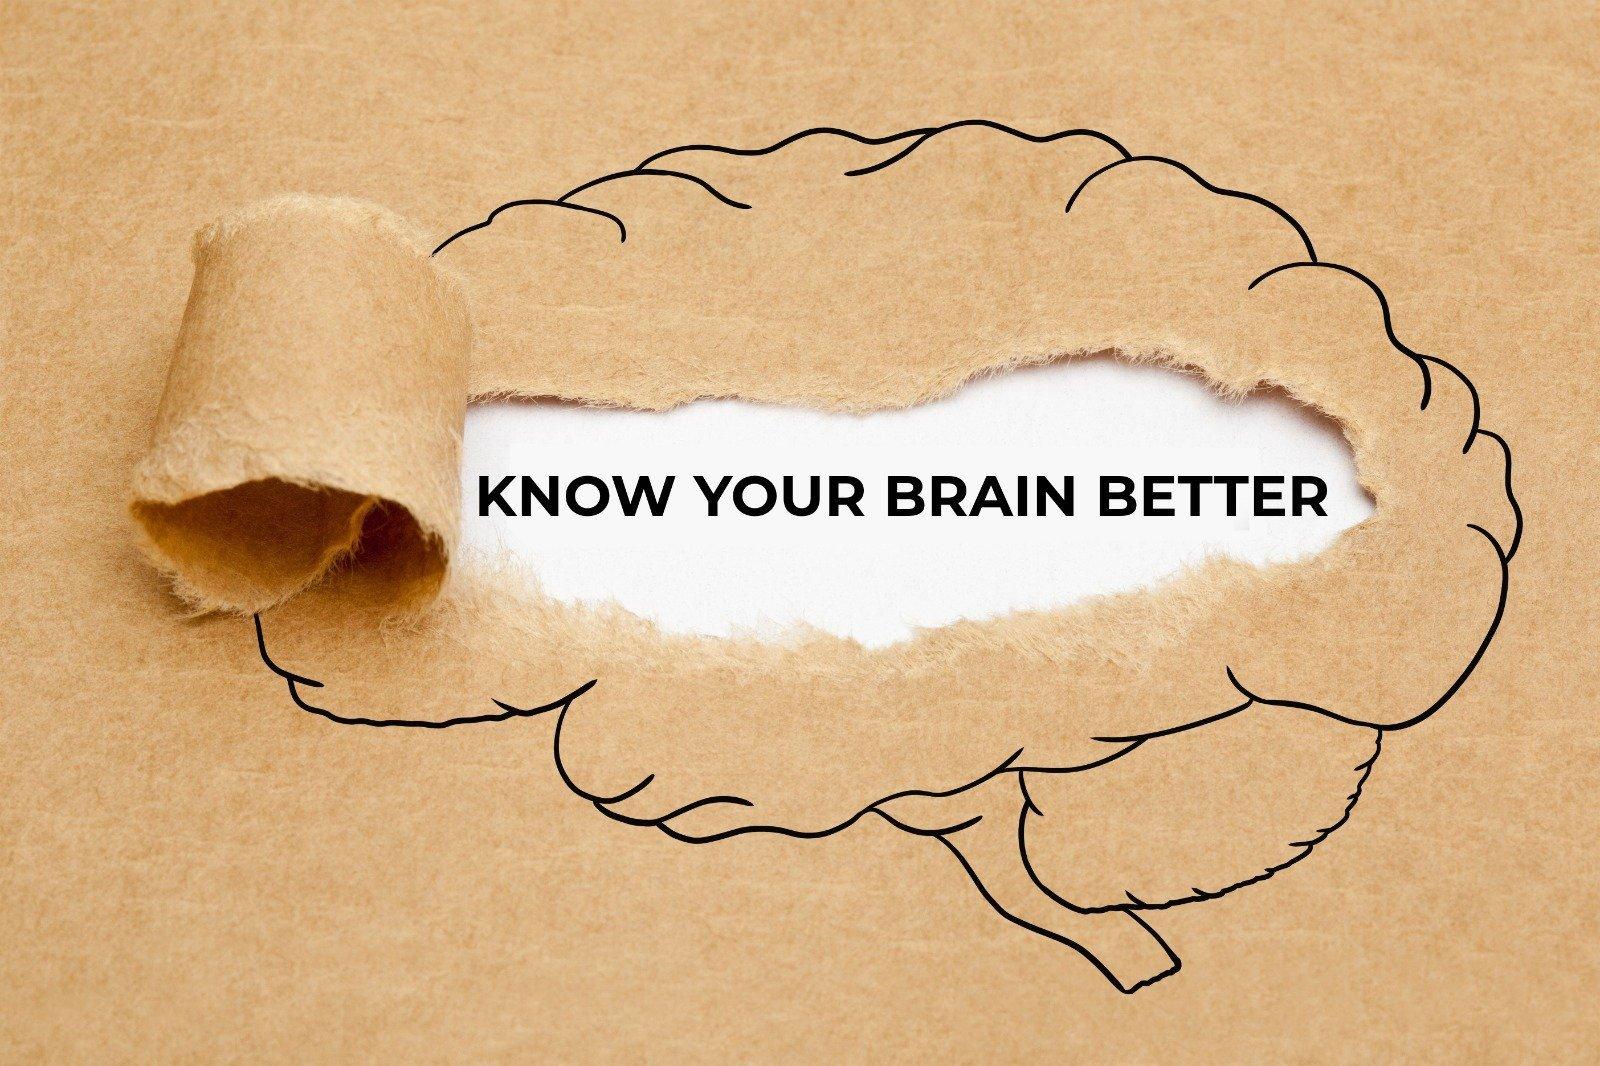 Gemi Bertran's Blog: Mental Health Month: Know your Brain Better